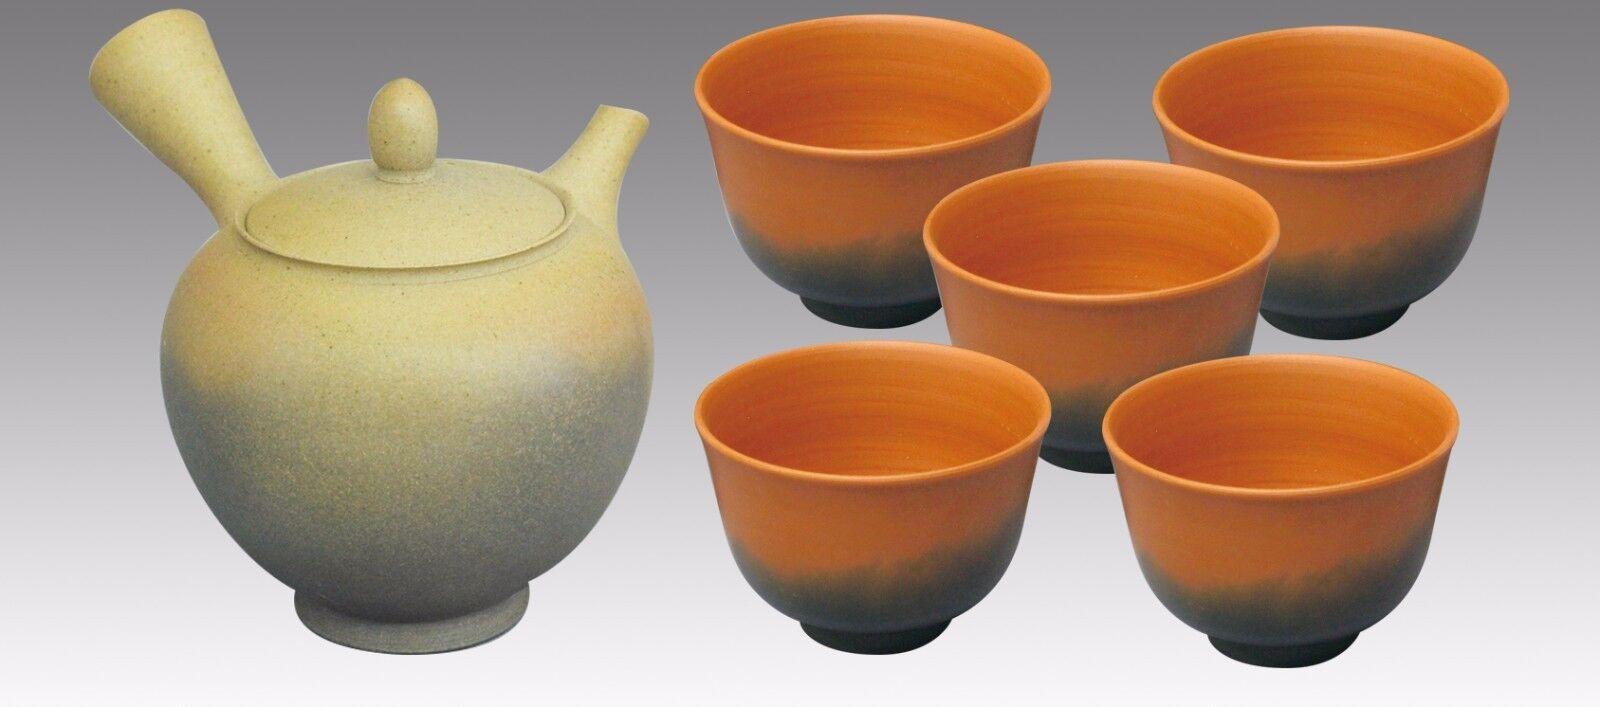 Japonais Kyusu teaset-Koji-Dawning 1pot & 5 chawan Cups